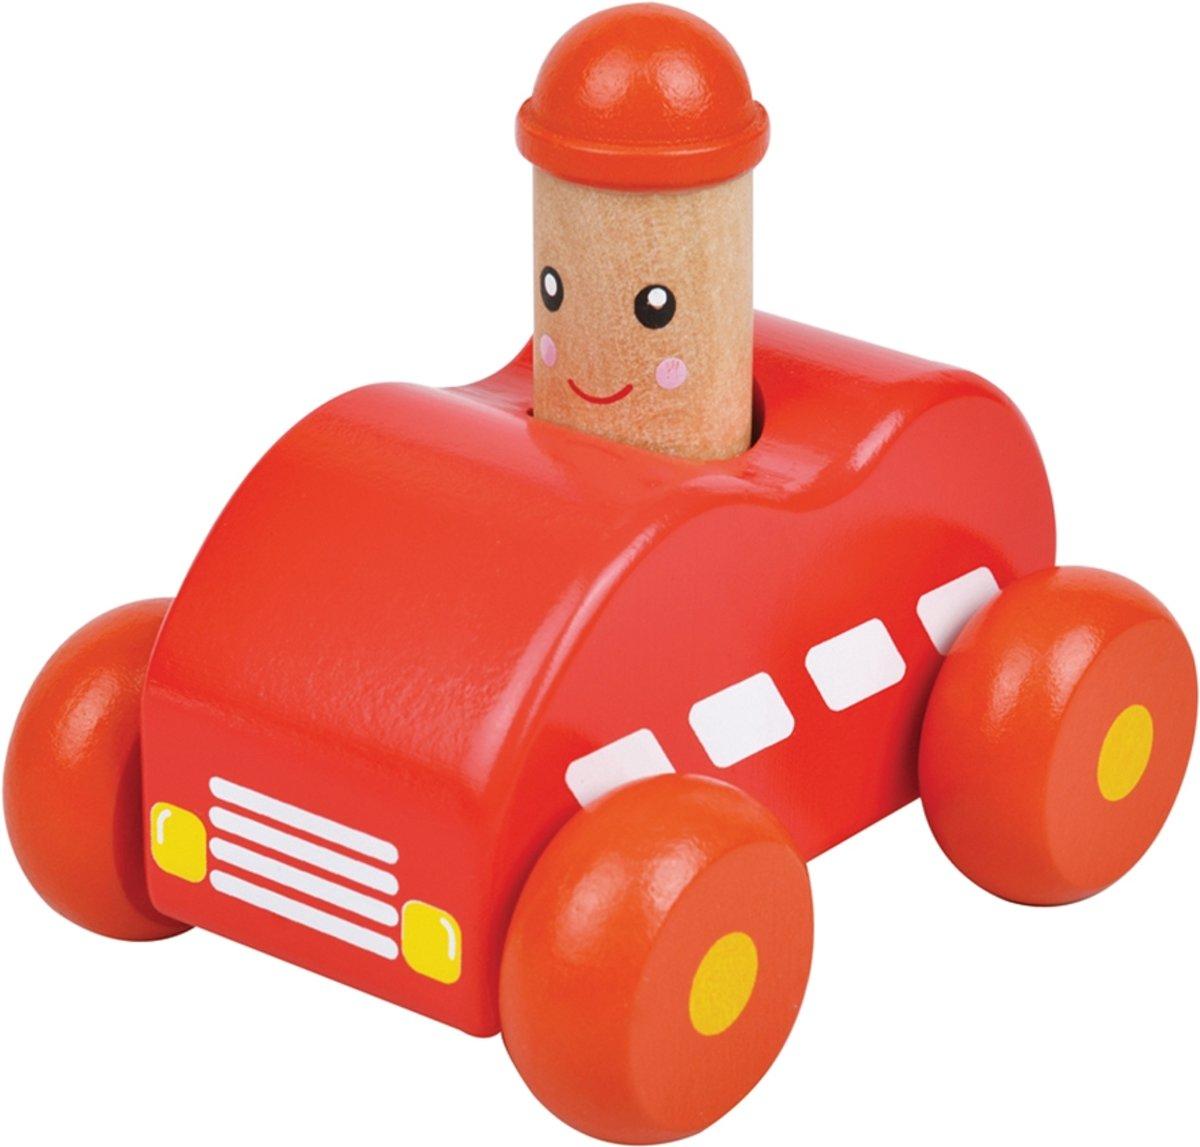 Lelin Toys - Squeaky Auto - Rood